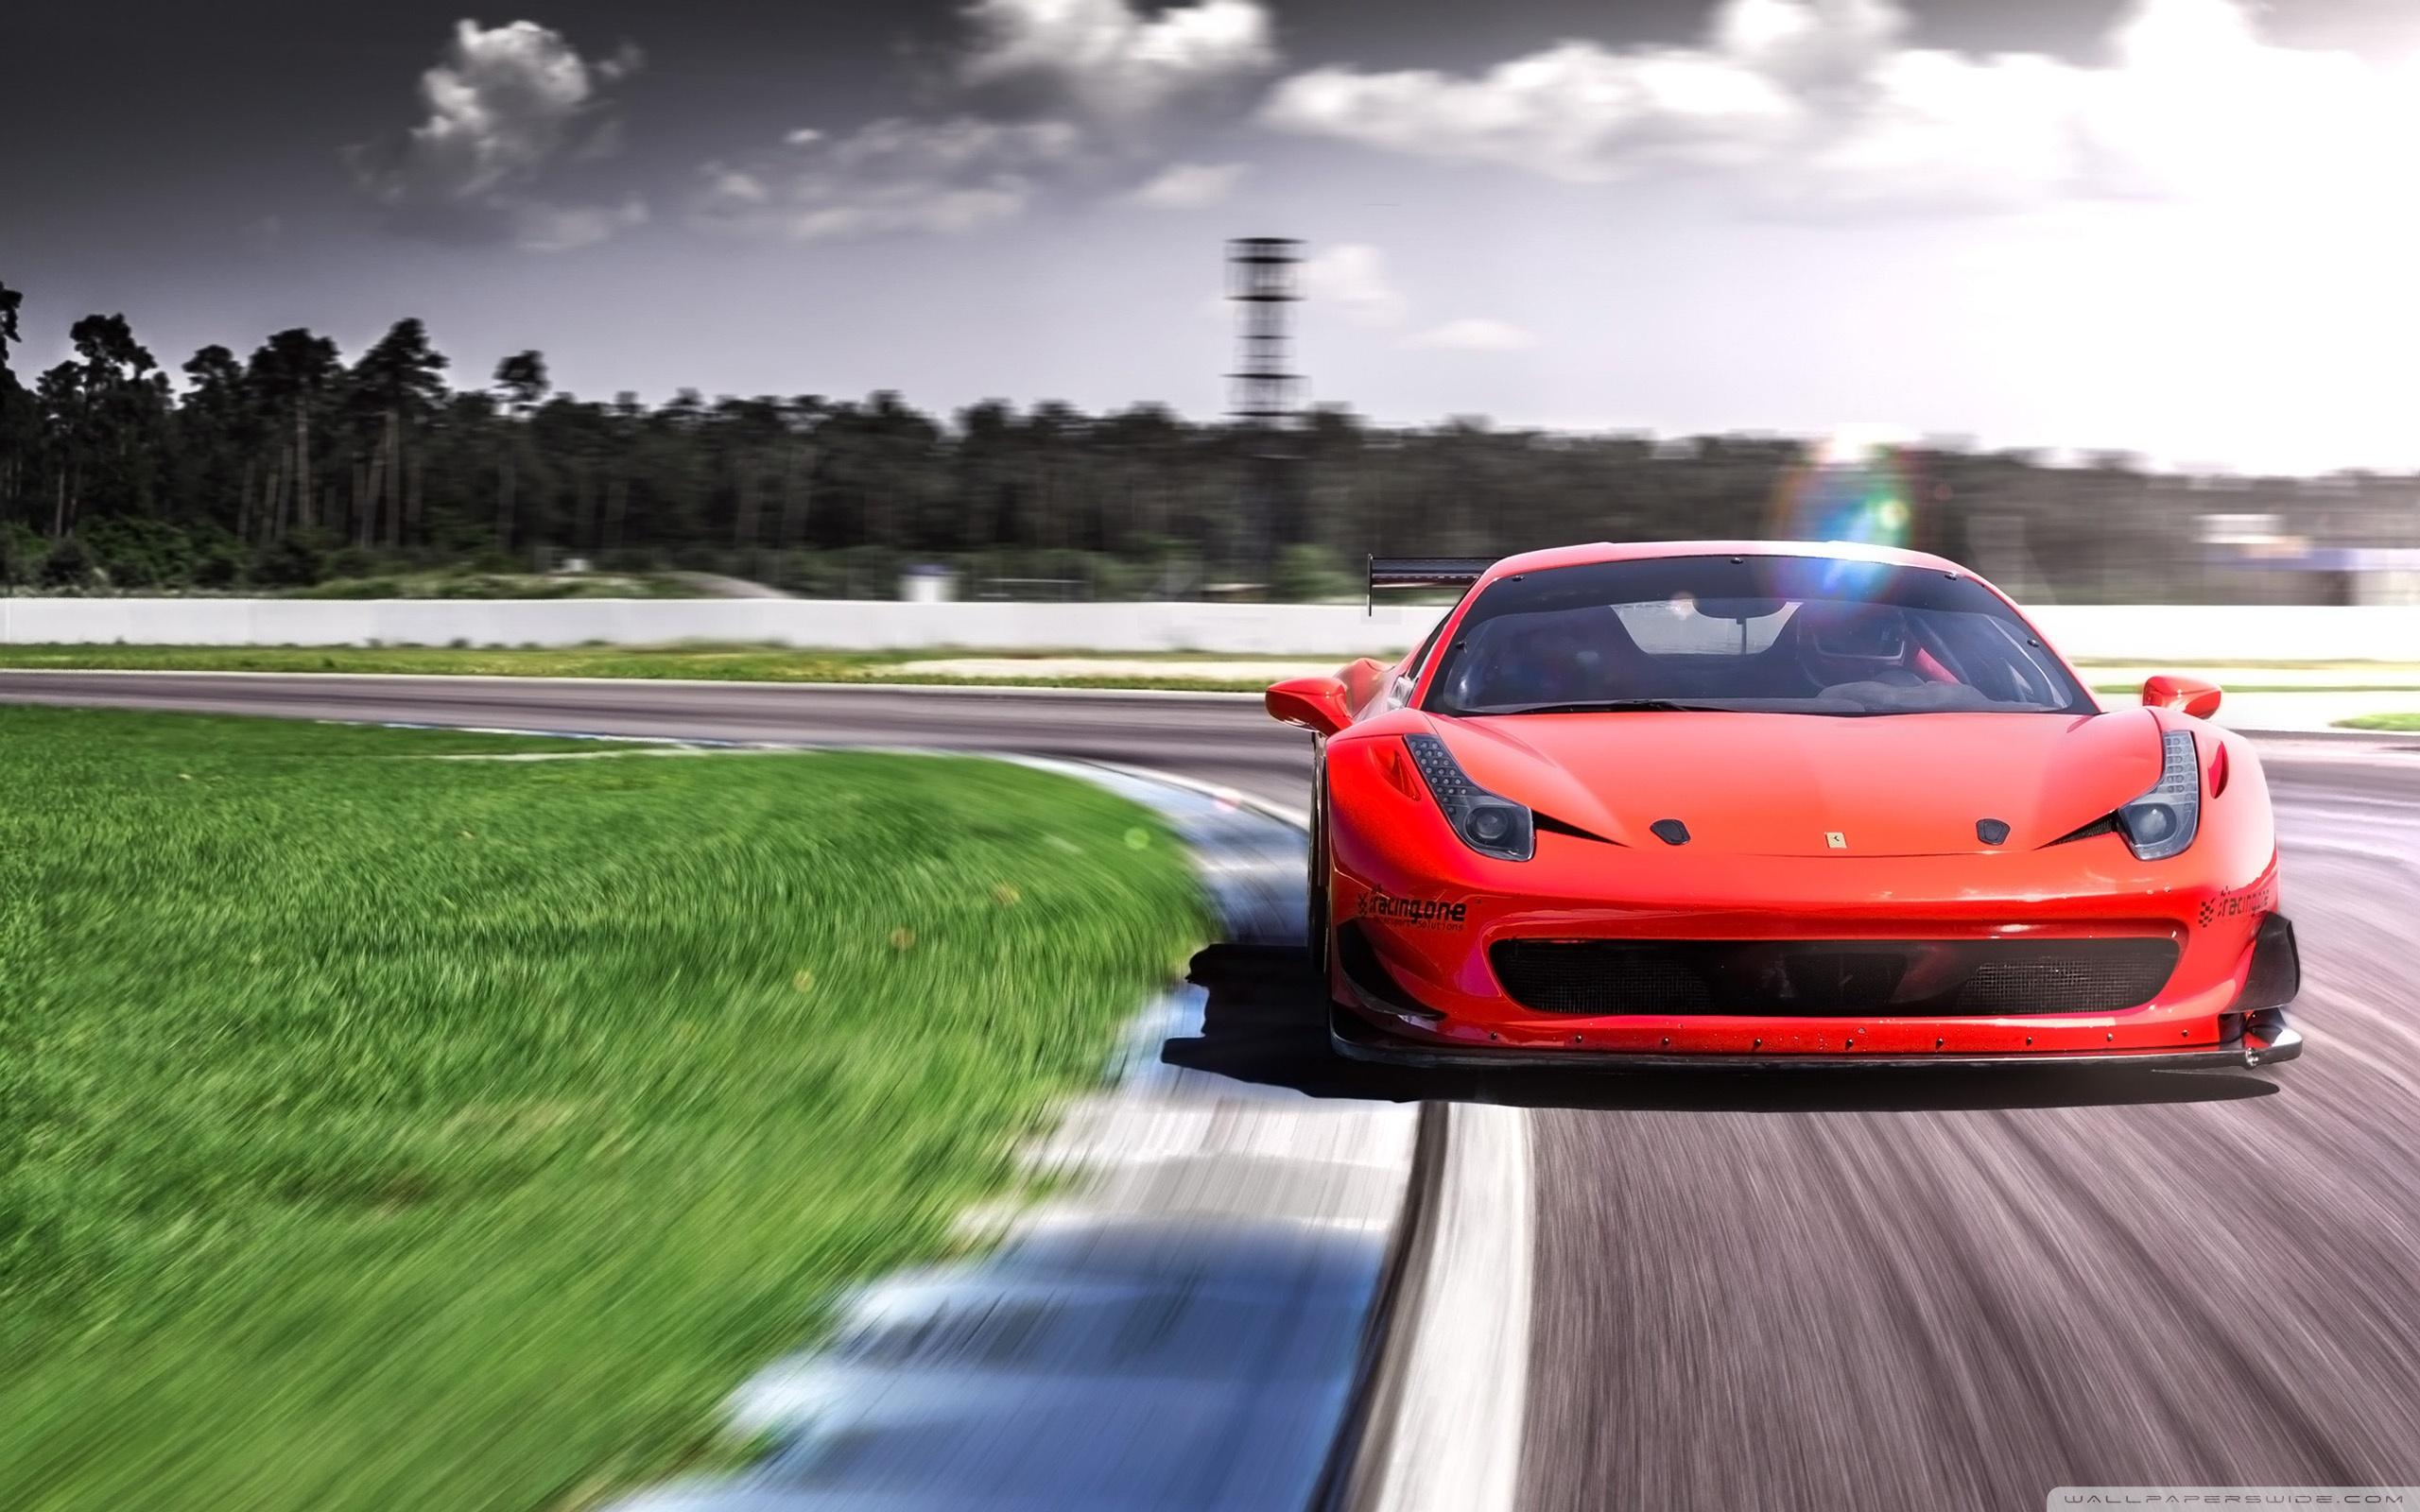 2016 Racing One Ferrari 458 Loma Wheels Hd Wide Wallpaper - Ferrari Hd Wallpapers For Desktop , HD Wallpaper & Backgrounds